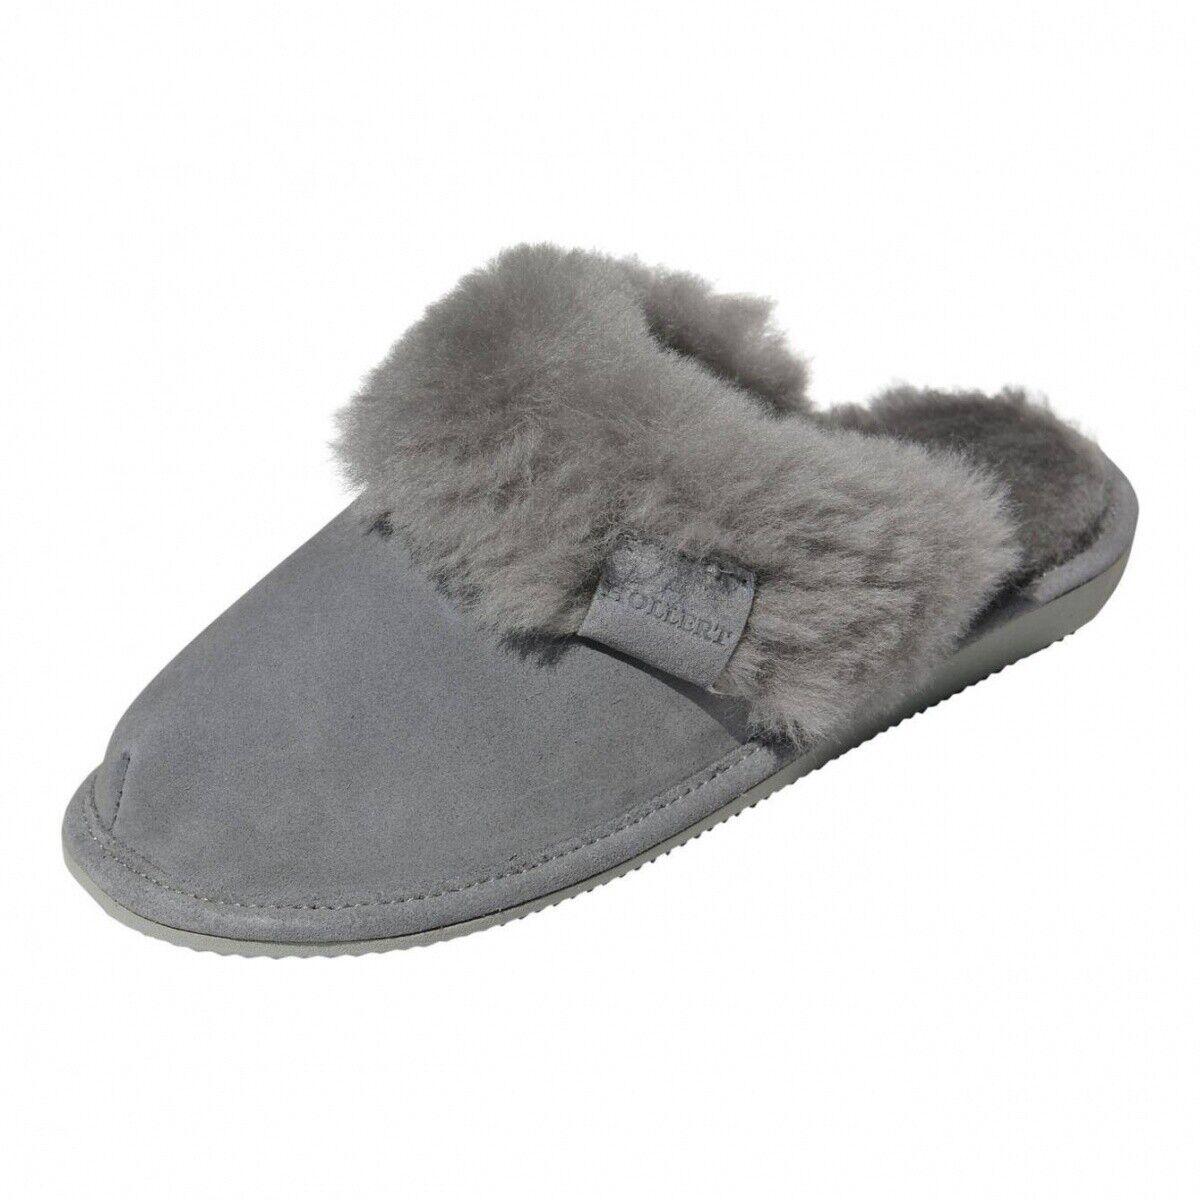 Hollert Ladies Merino Sheepskin Slippers Malibu Grey Slippers Real Leather